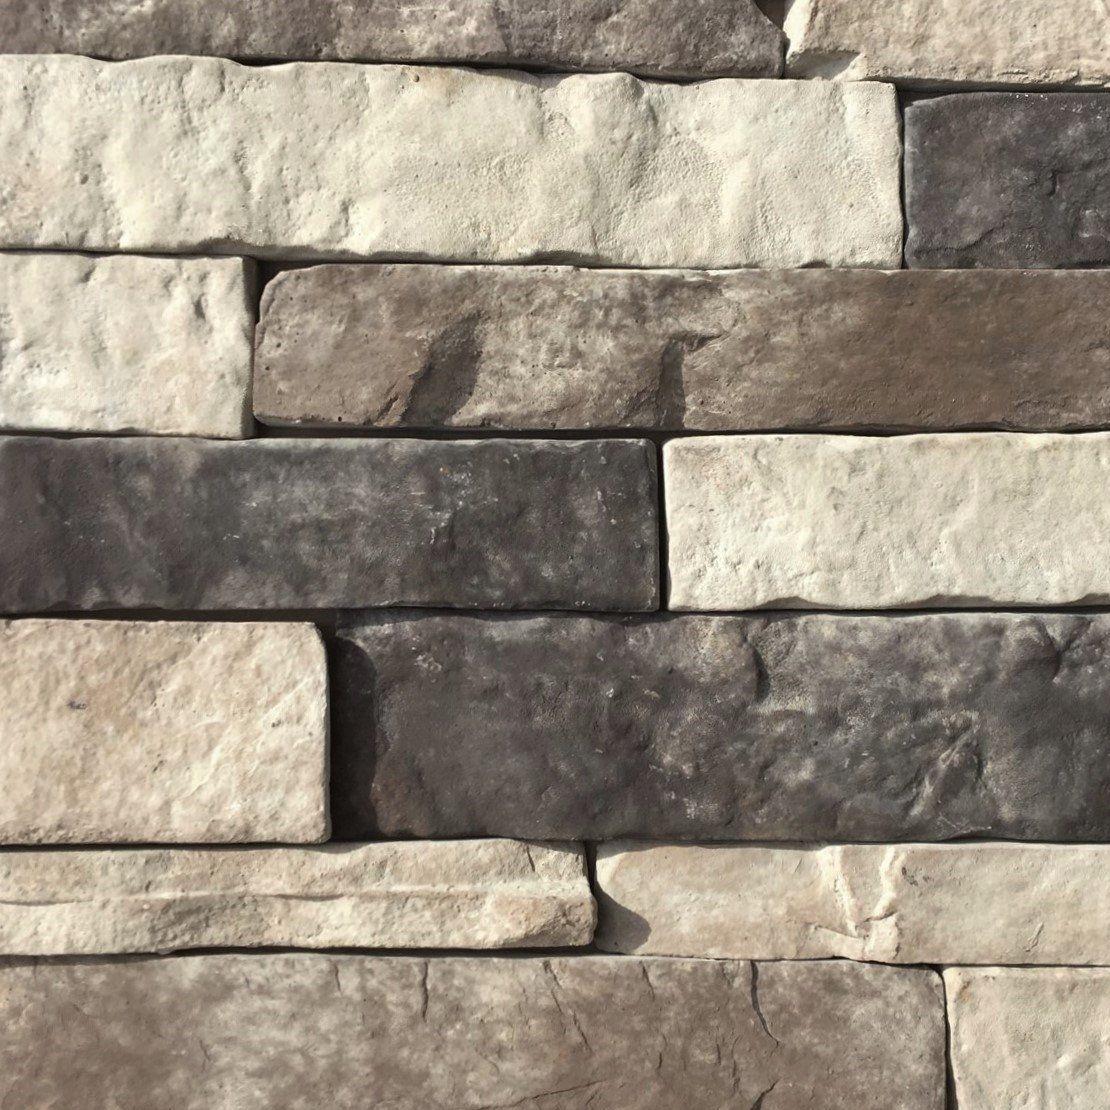 Patiostone Veneer Accent Wall: Stone Accent Walls, Stone Veneer